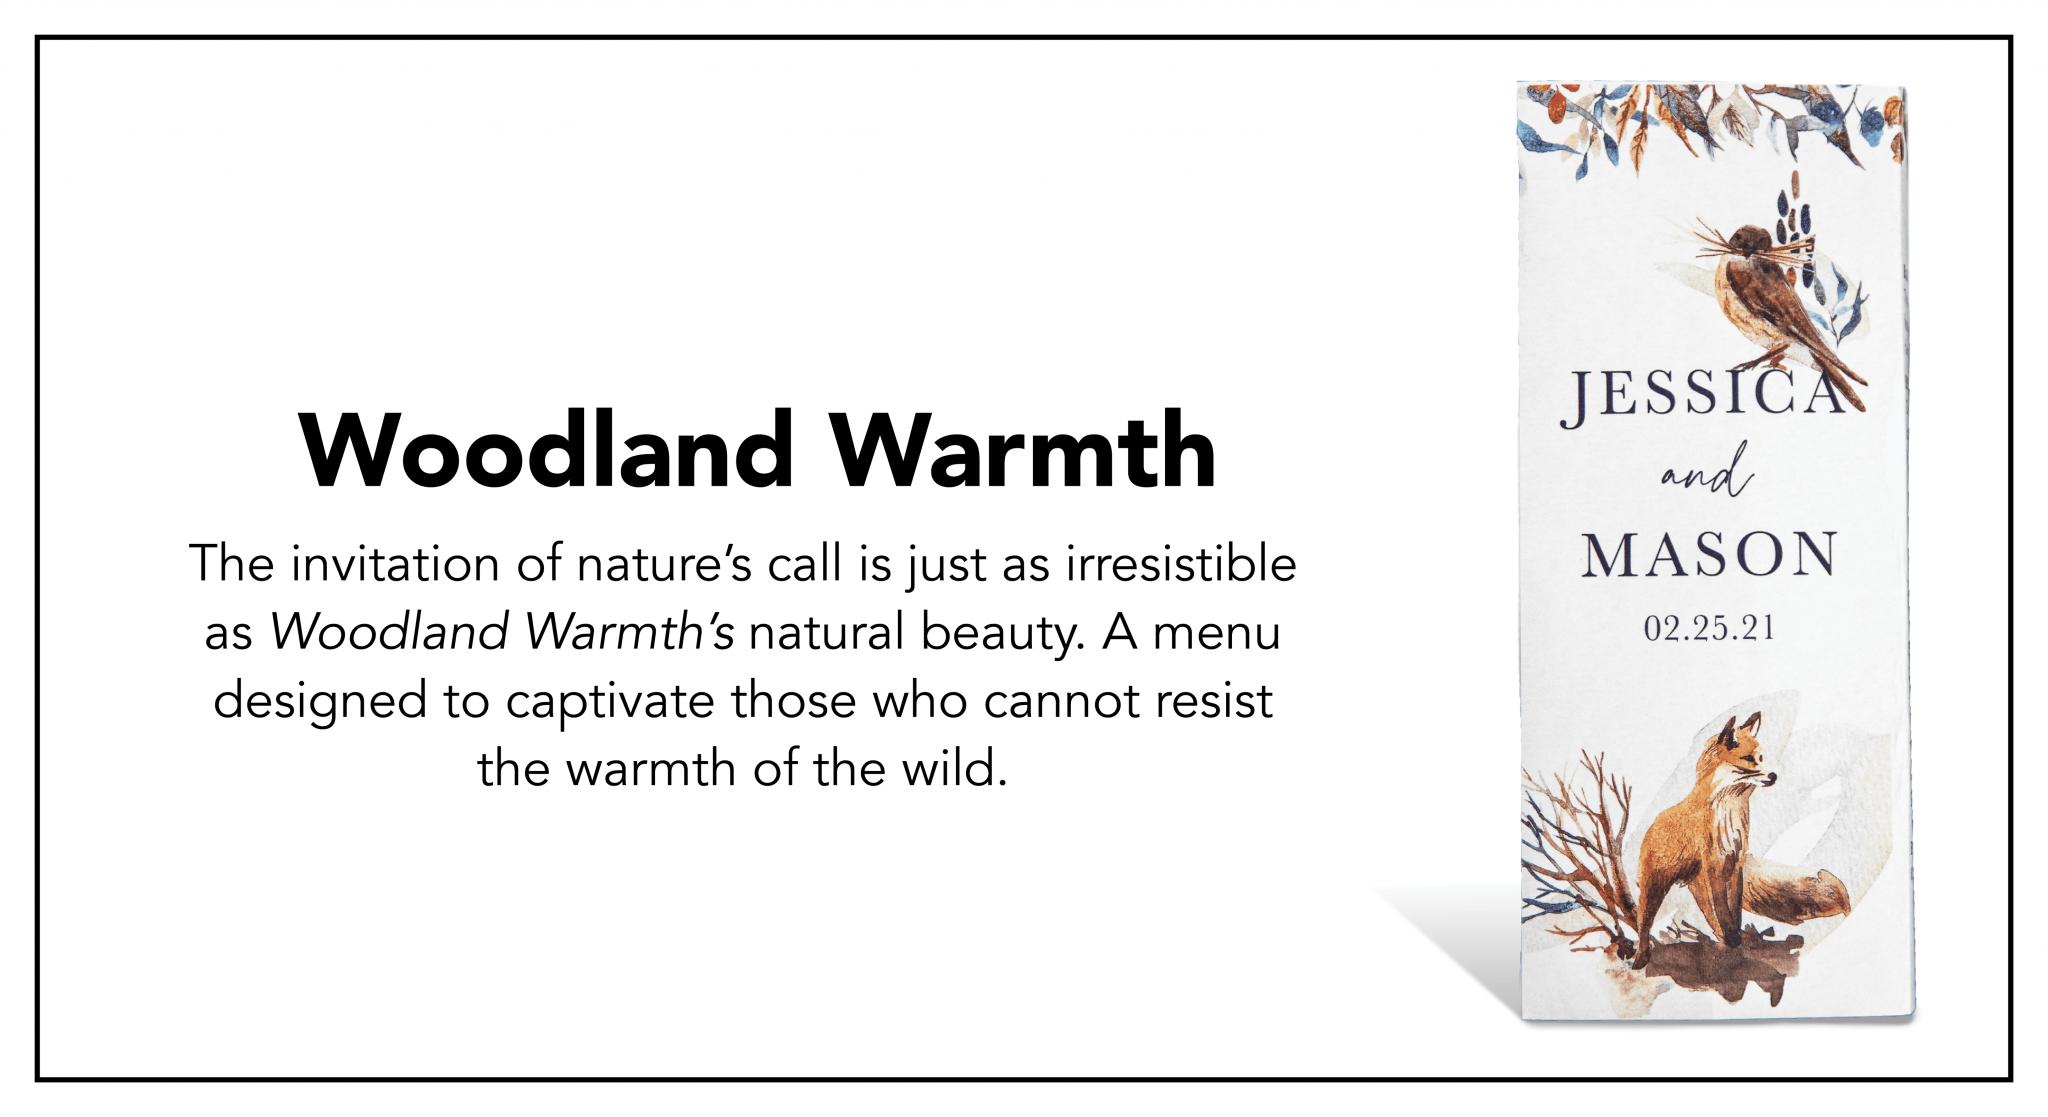 WOODLAND WARMTH